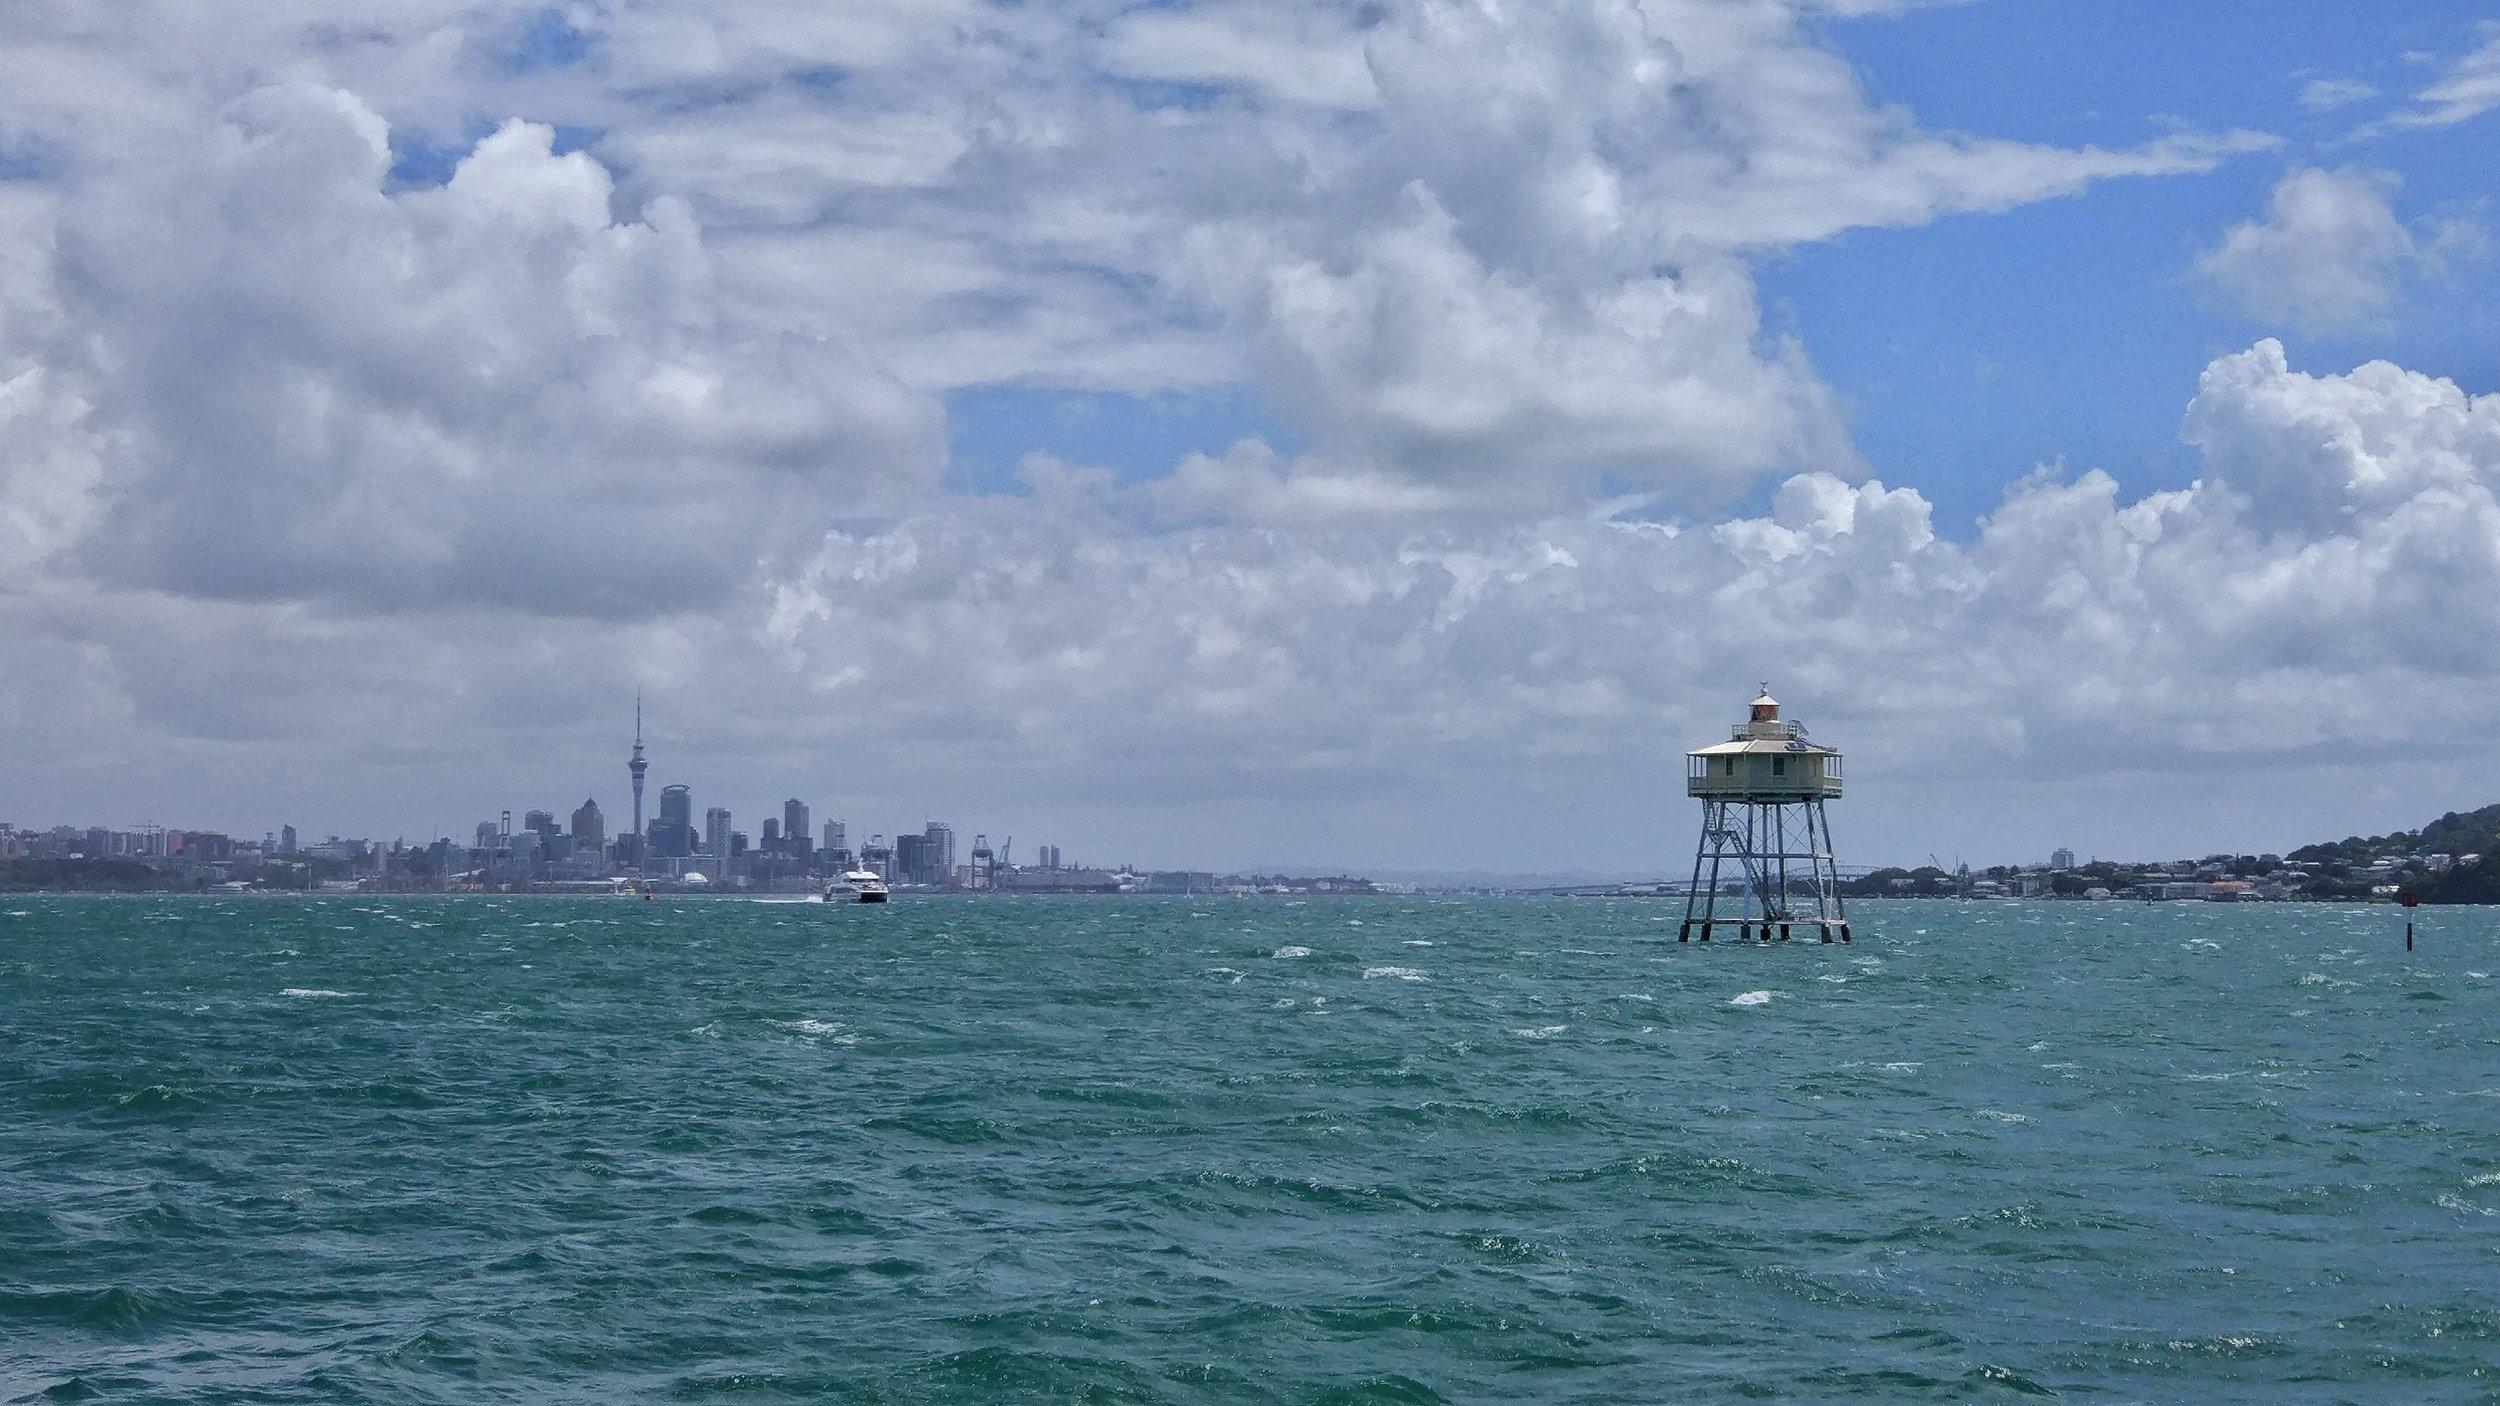 Bean Rock Lighthouse with the Auckland Skyline - lovely!